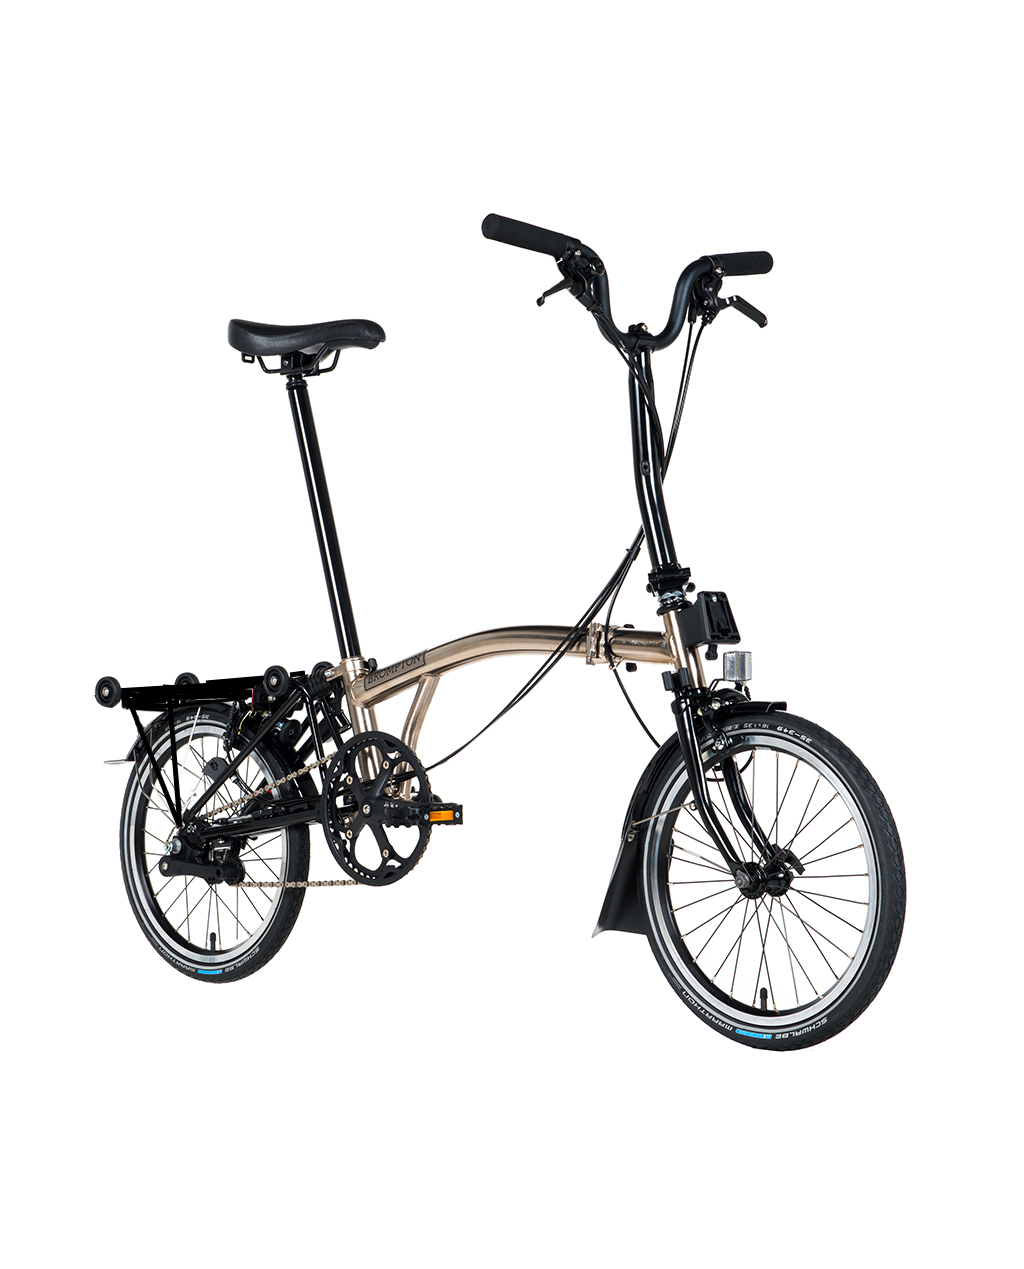 Bicicleta pliabila Brompton H2R/Ni/Bk Nickel Edition 2018